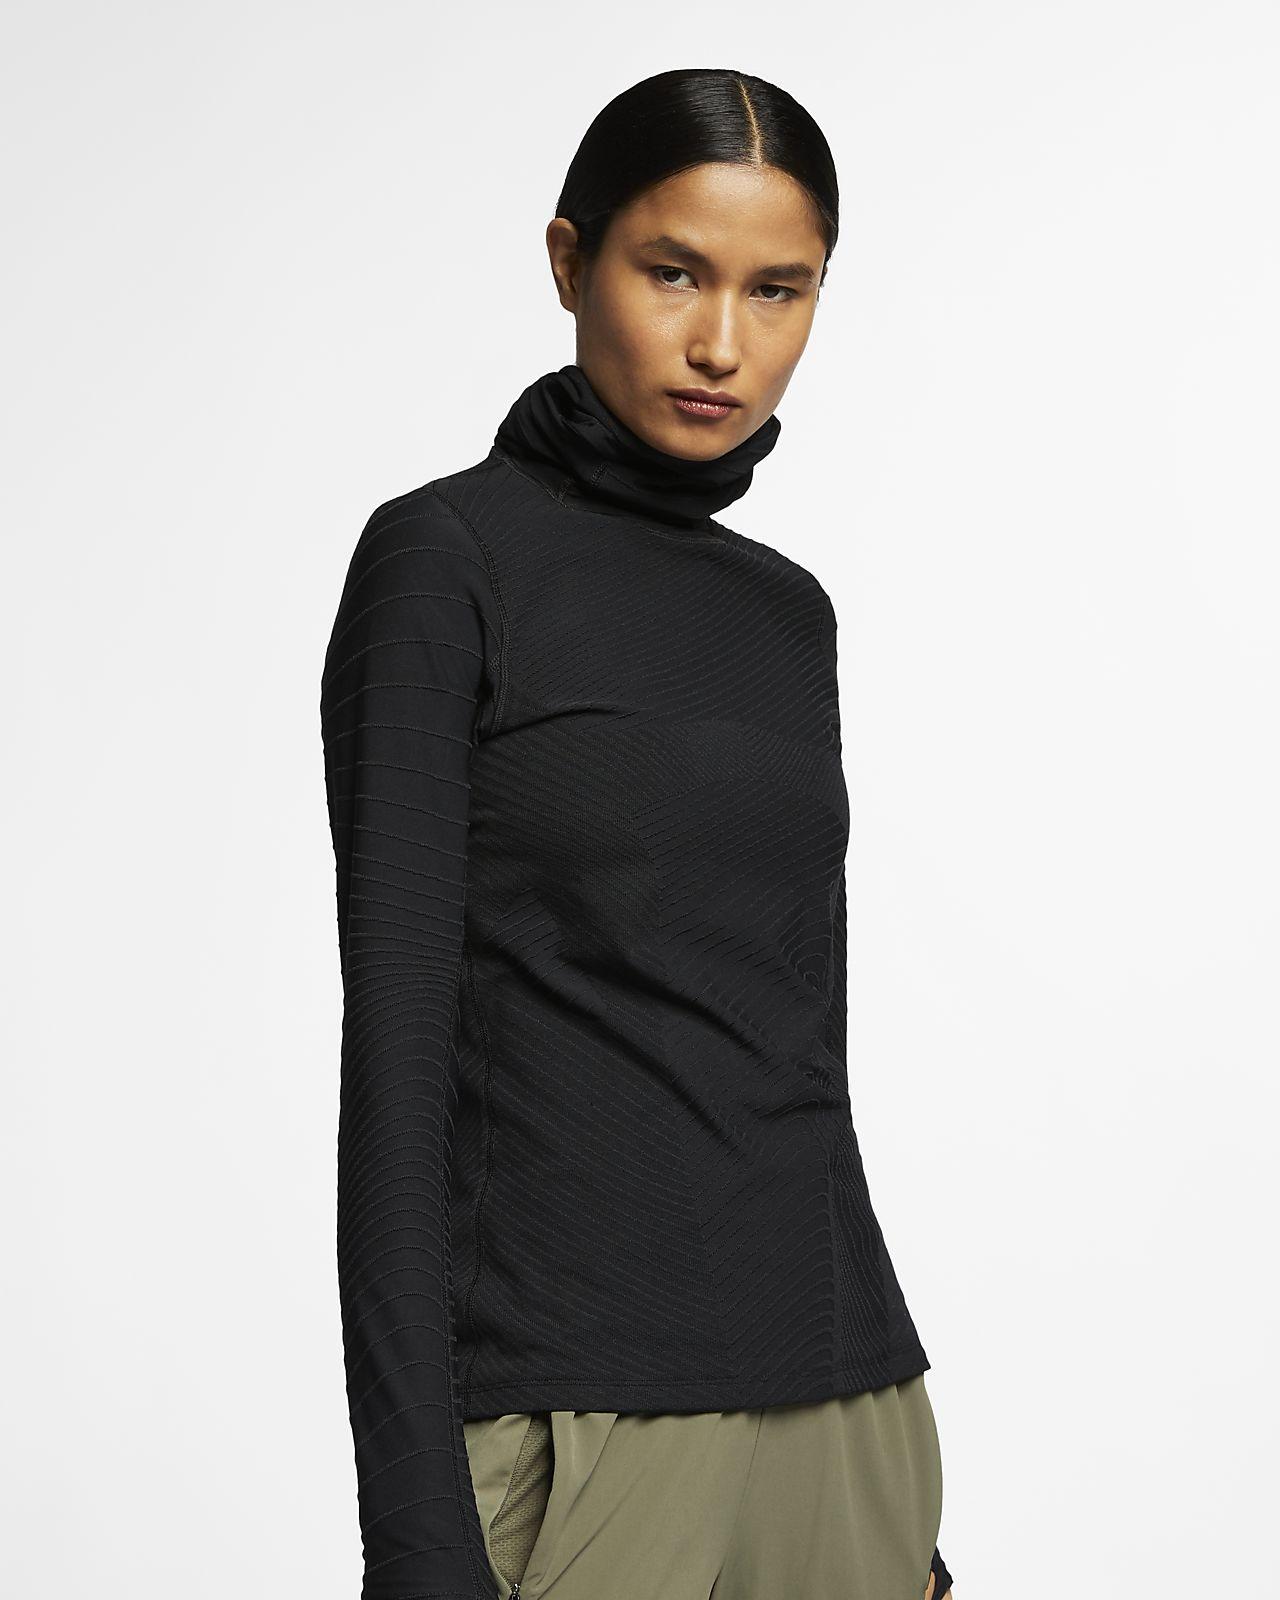 premium selection 09b1a 0aeb4 ... Sudadera con capucha de running para mujer Nike Element